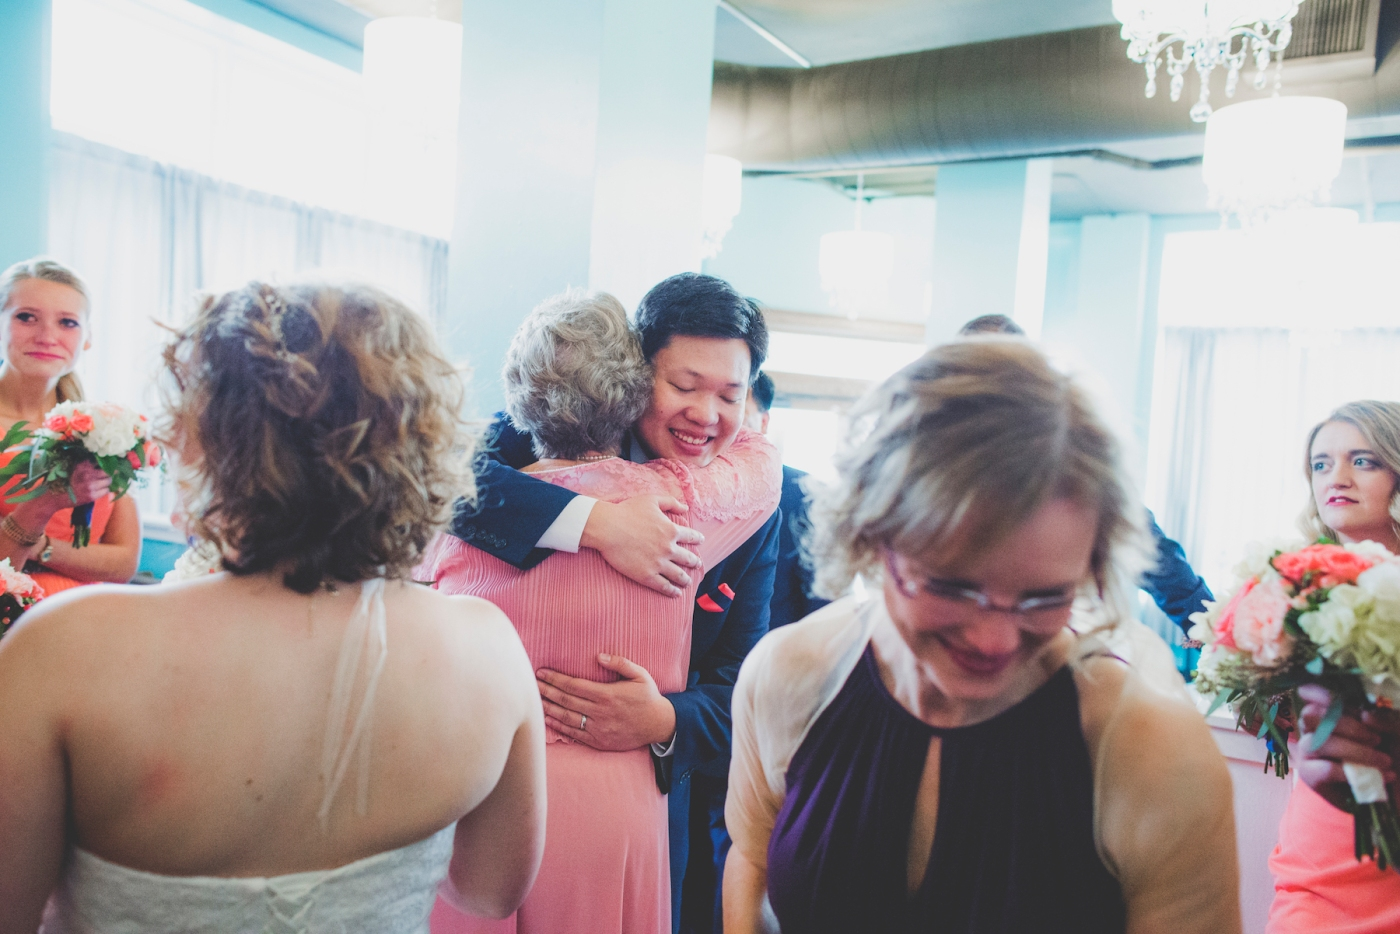 DSC_2796Everett_Wedding_Ballroom_Jane_Speleers_photography_Rachel_and_Edmund_Ceremony_2017